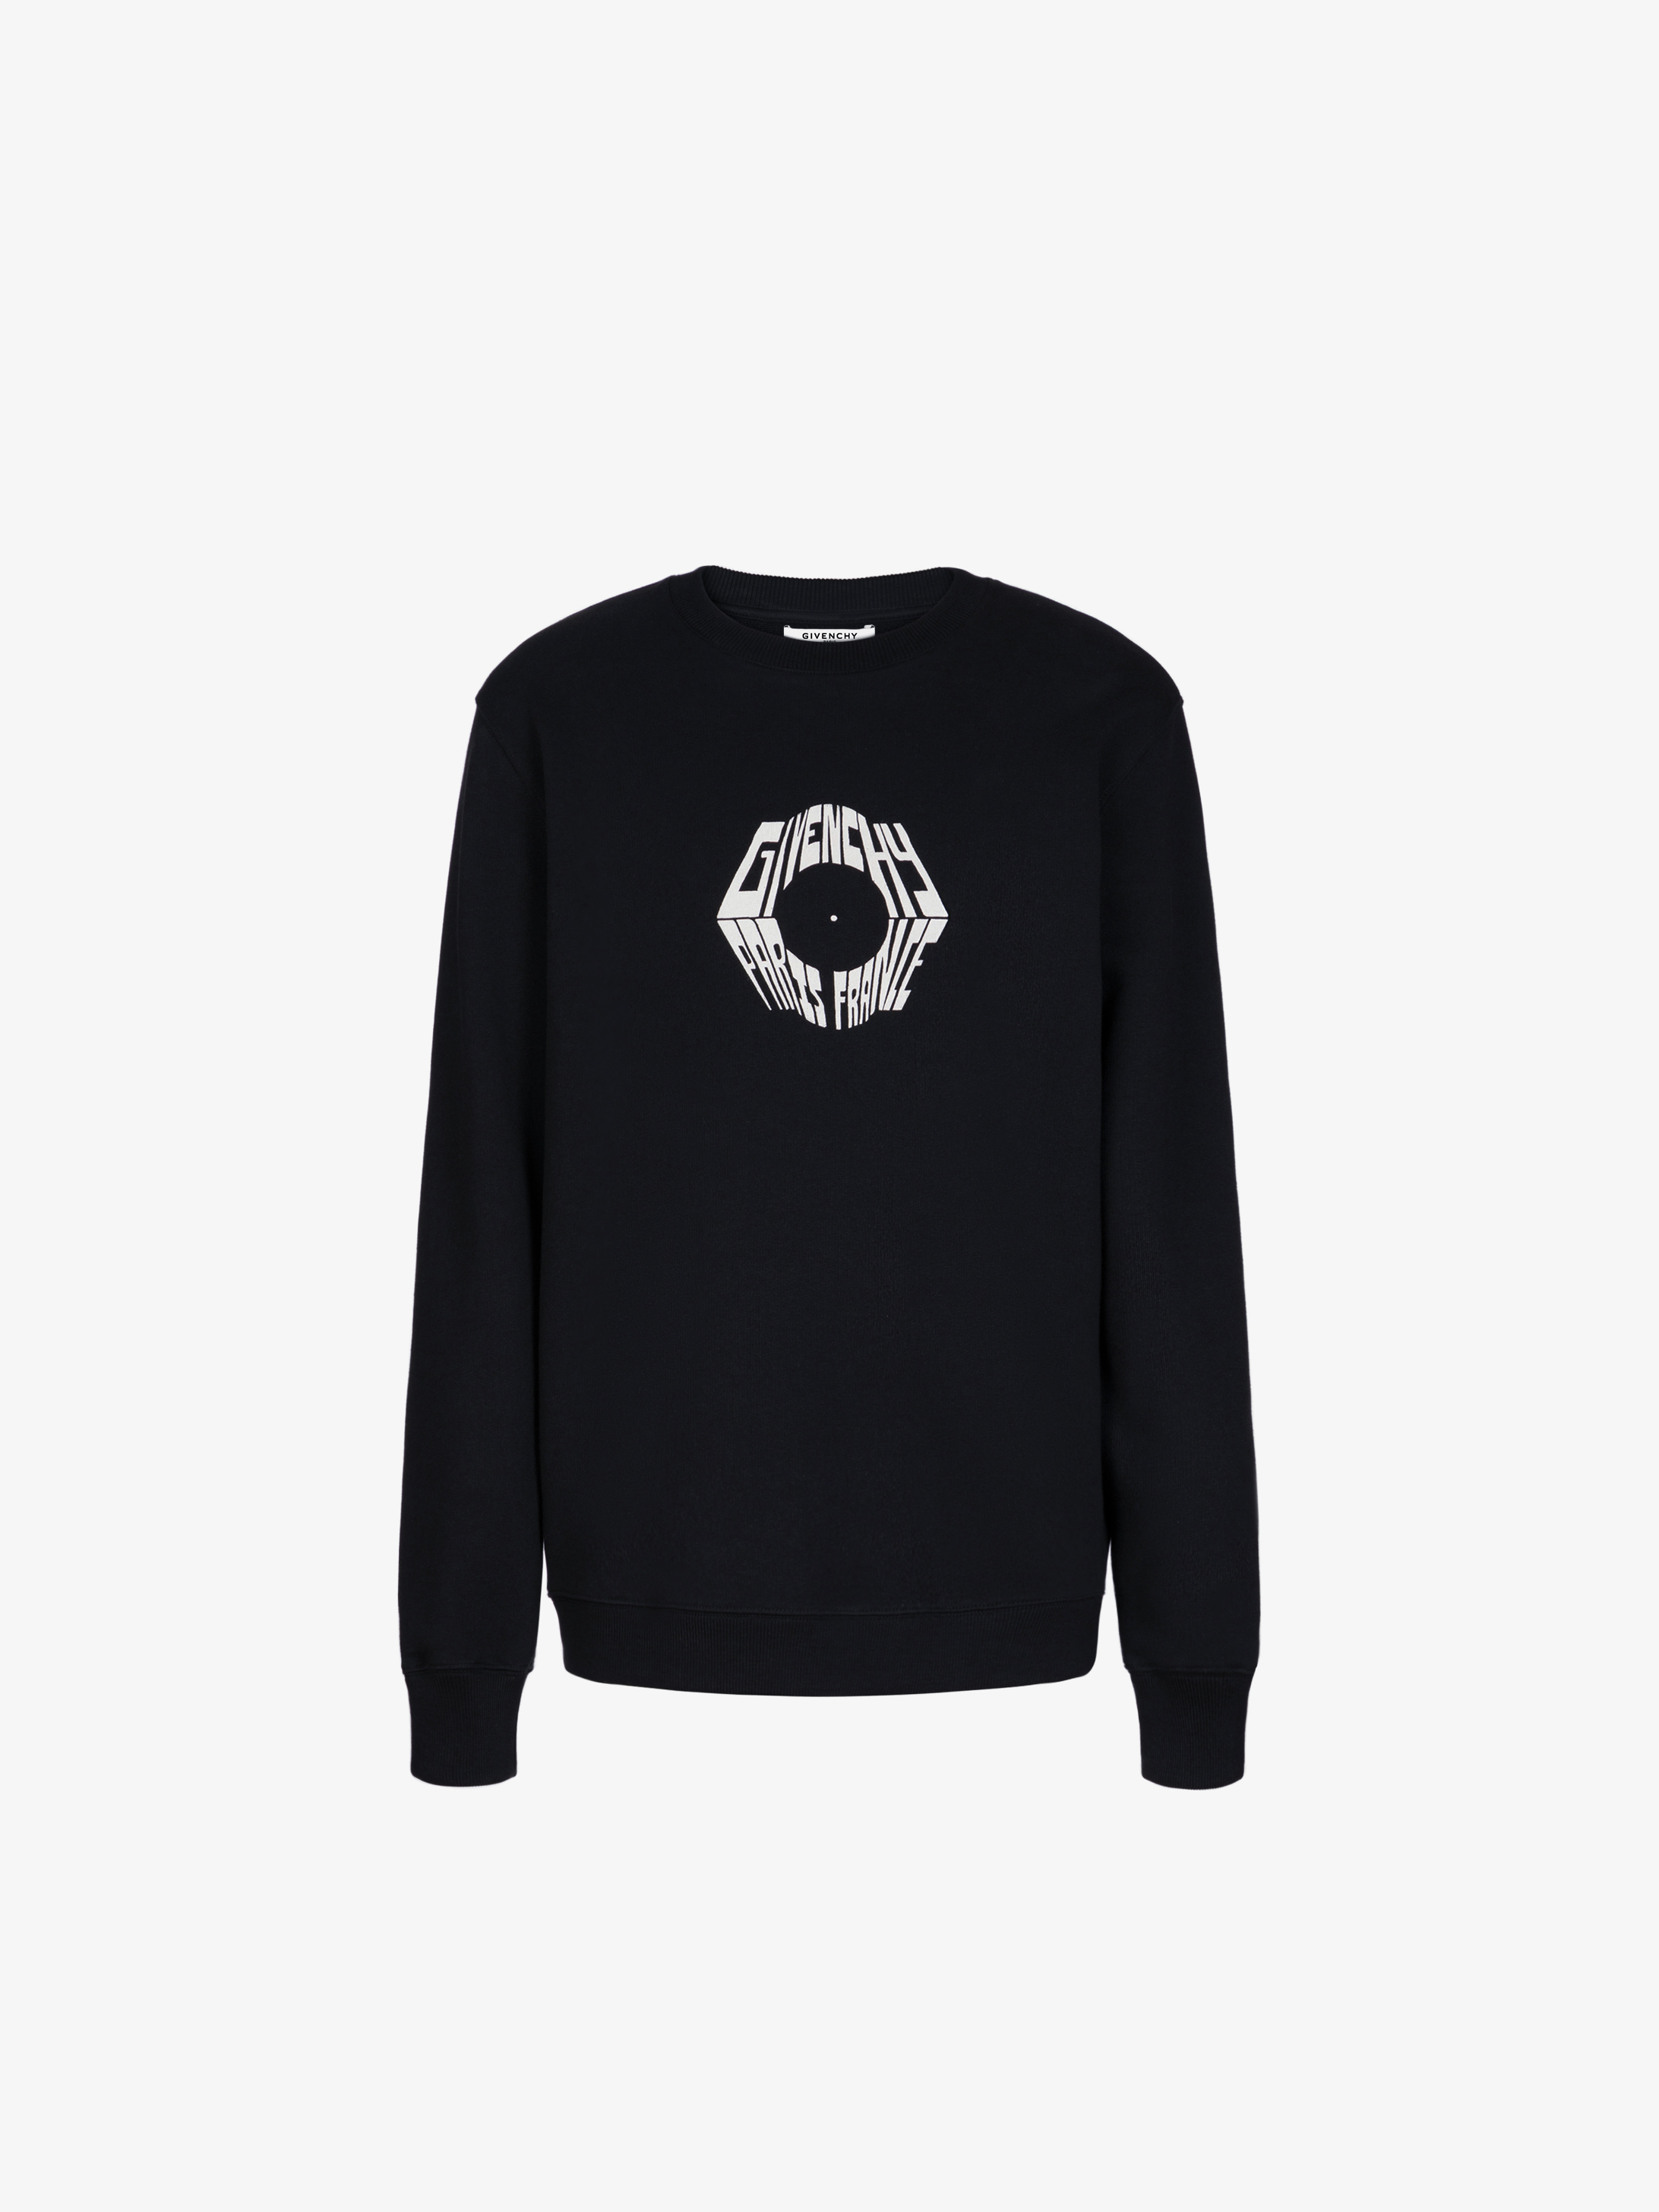 Givenchy Paris Eagle printed Slim fit sweatshirt